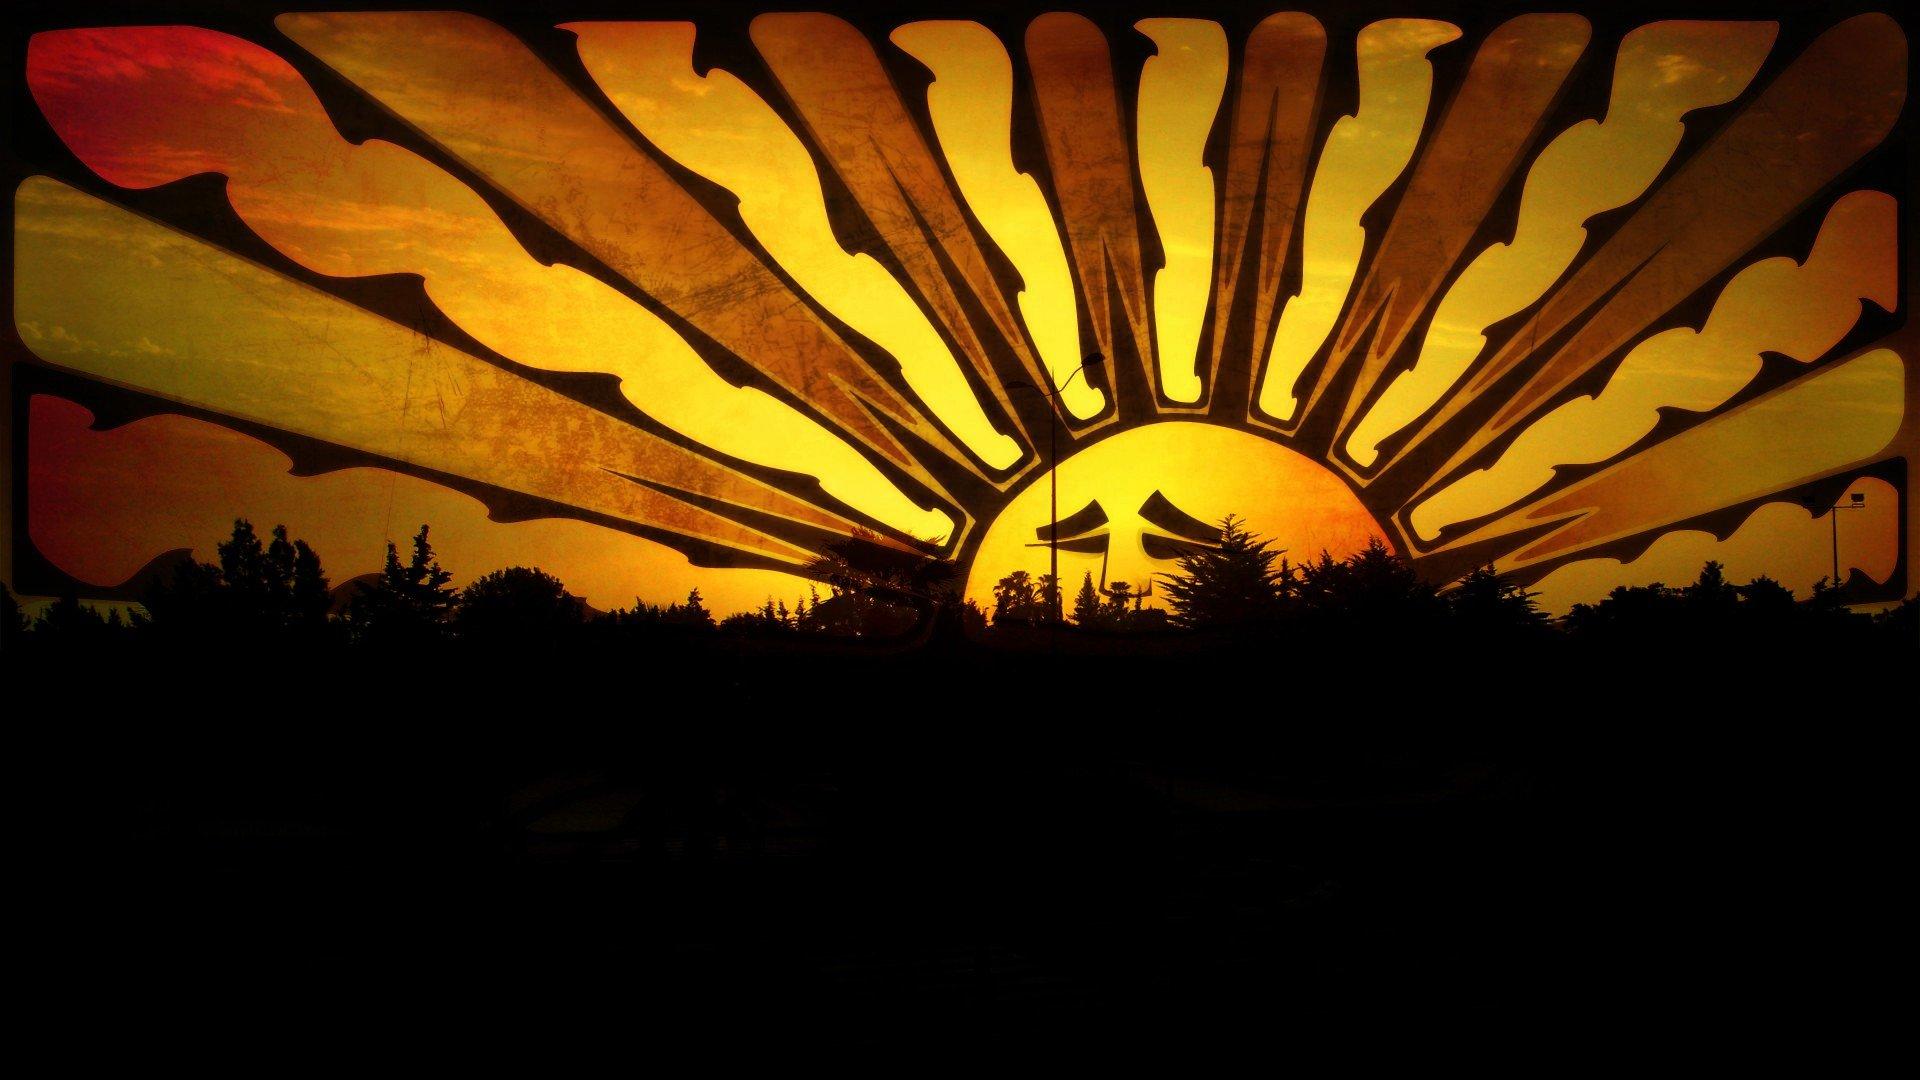 Ganja Girl Wallpaper Sunset Sun Orange Sad Morocco Orange Sky Wallpaper